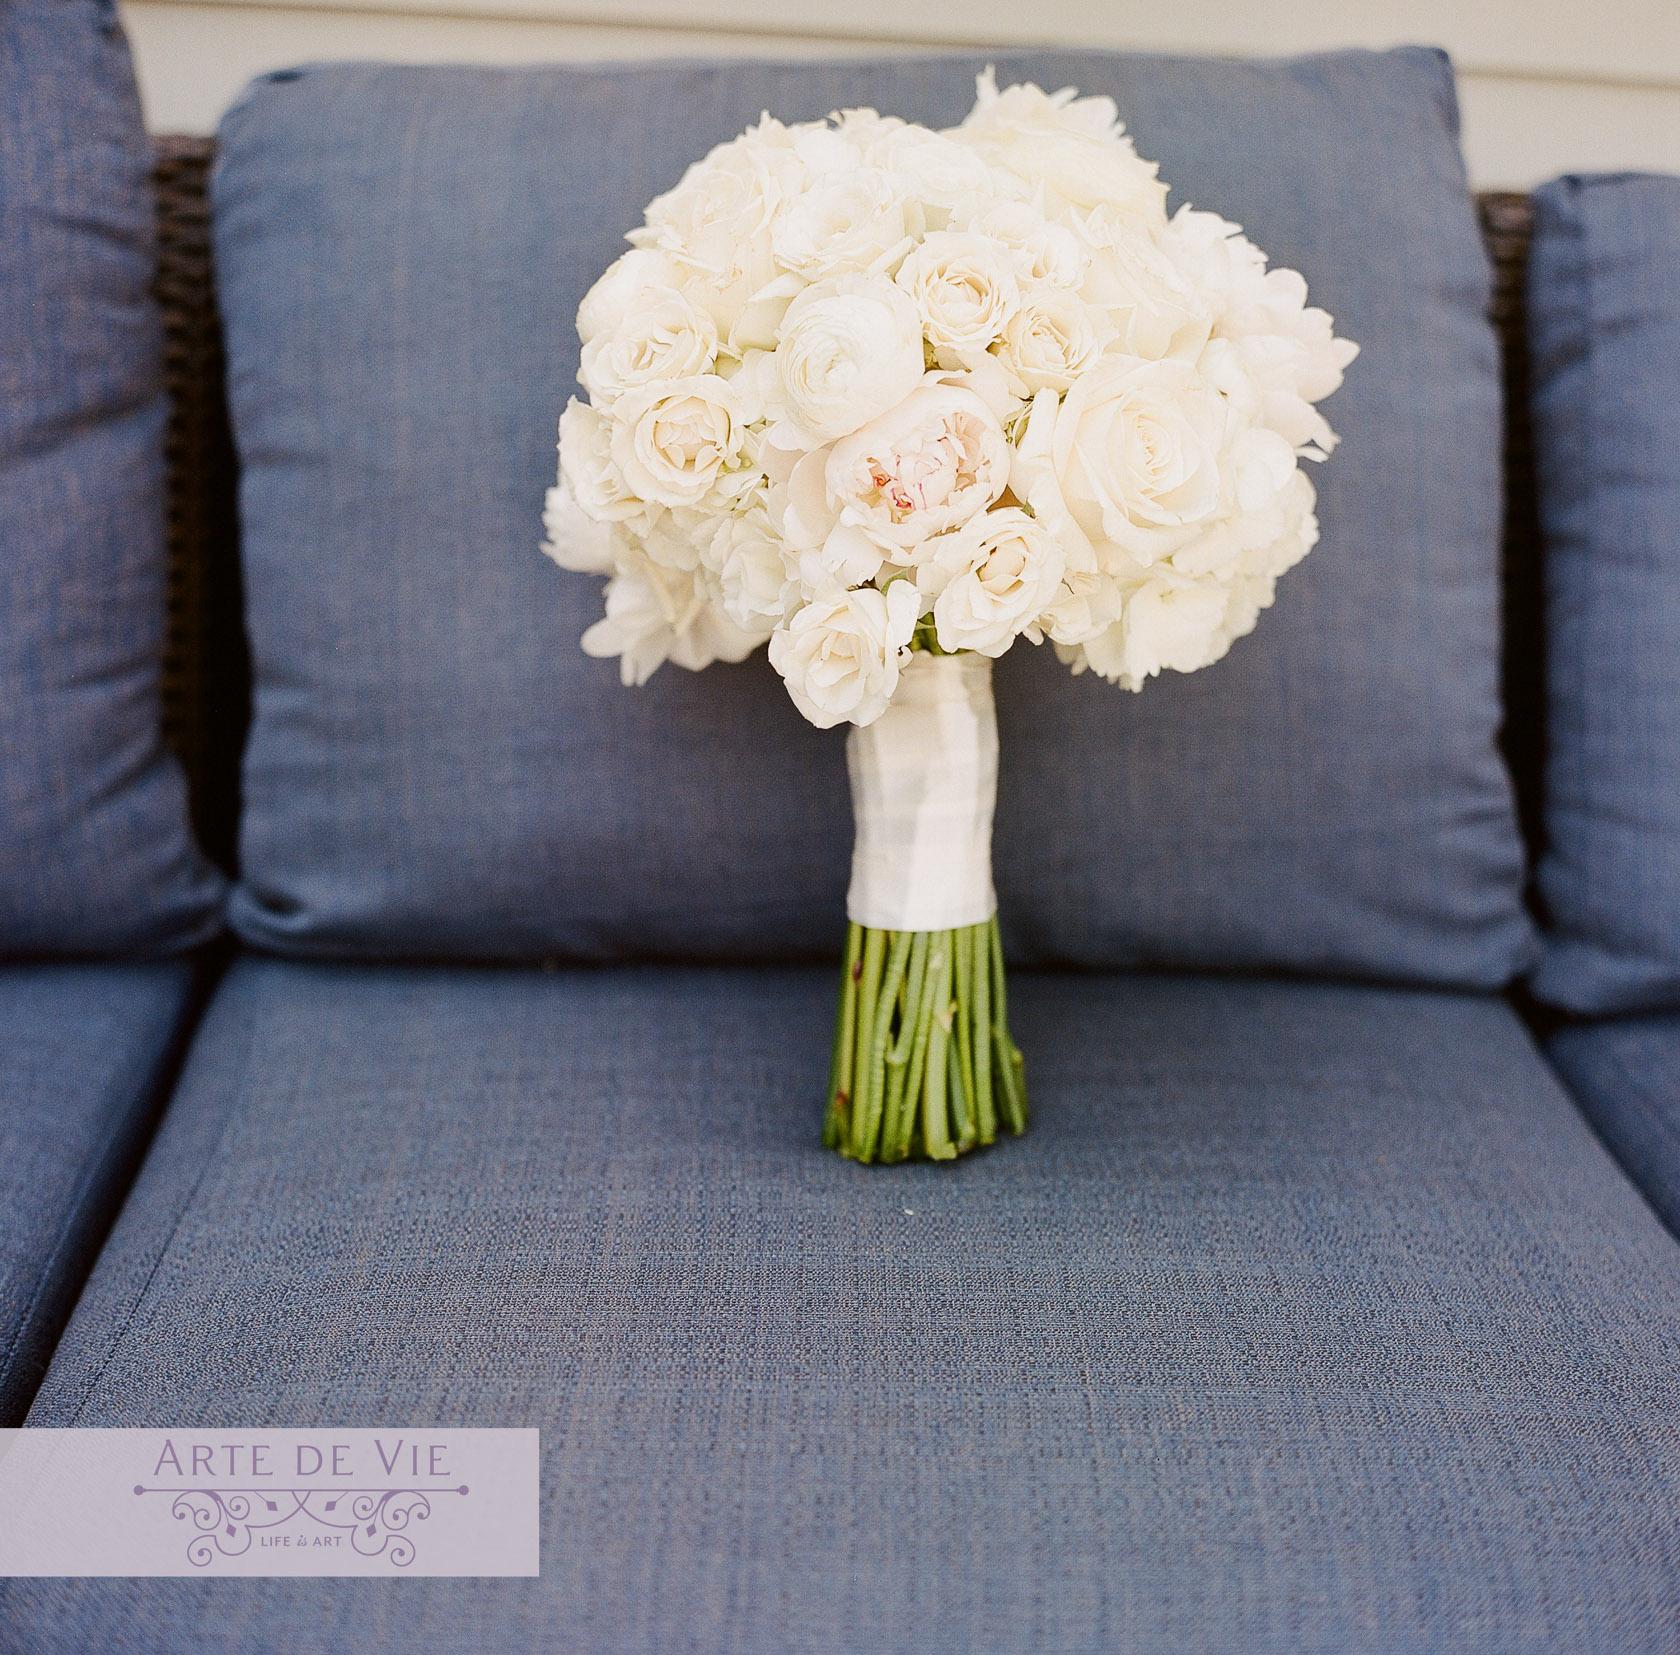 11-Echols Wedding Film Images.jpg